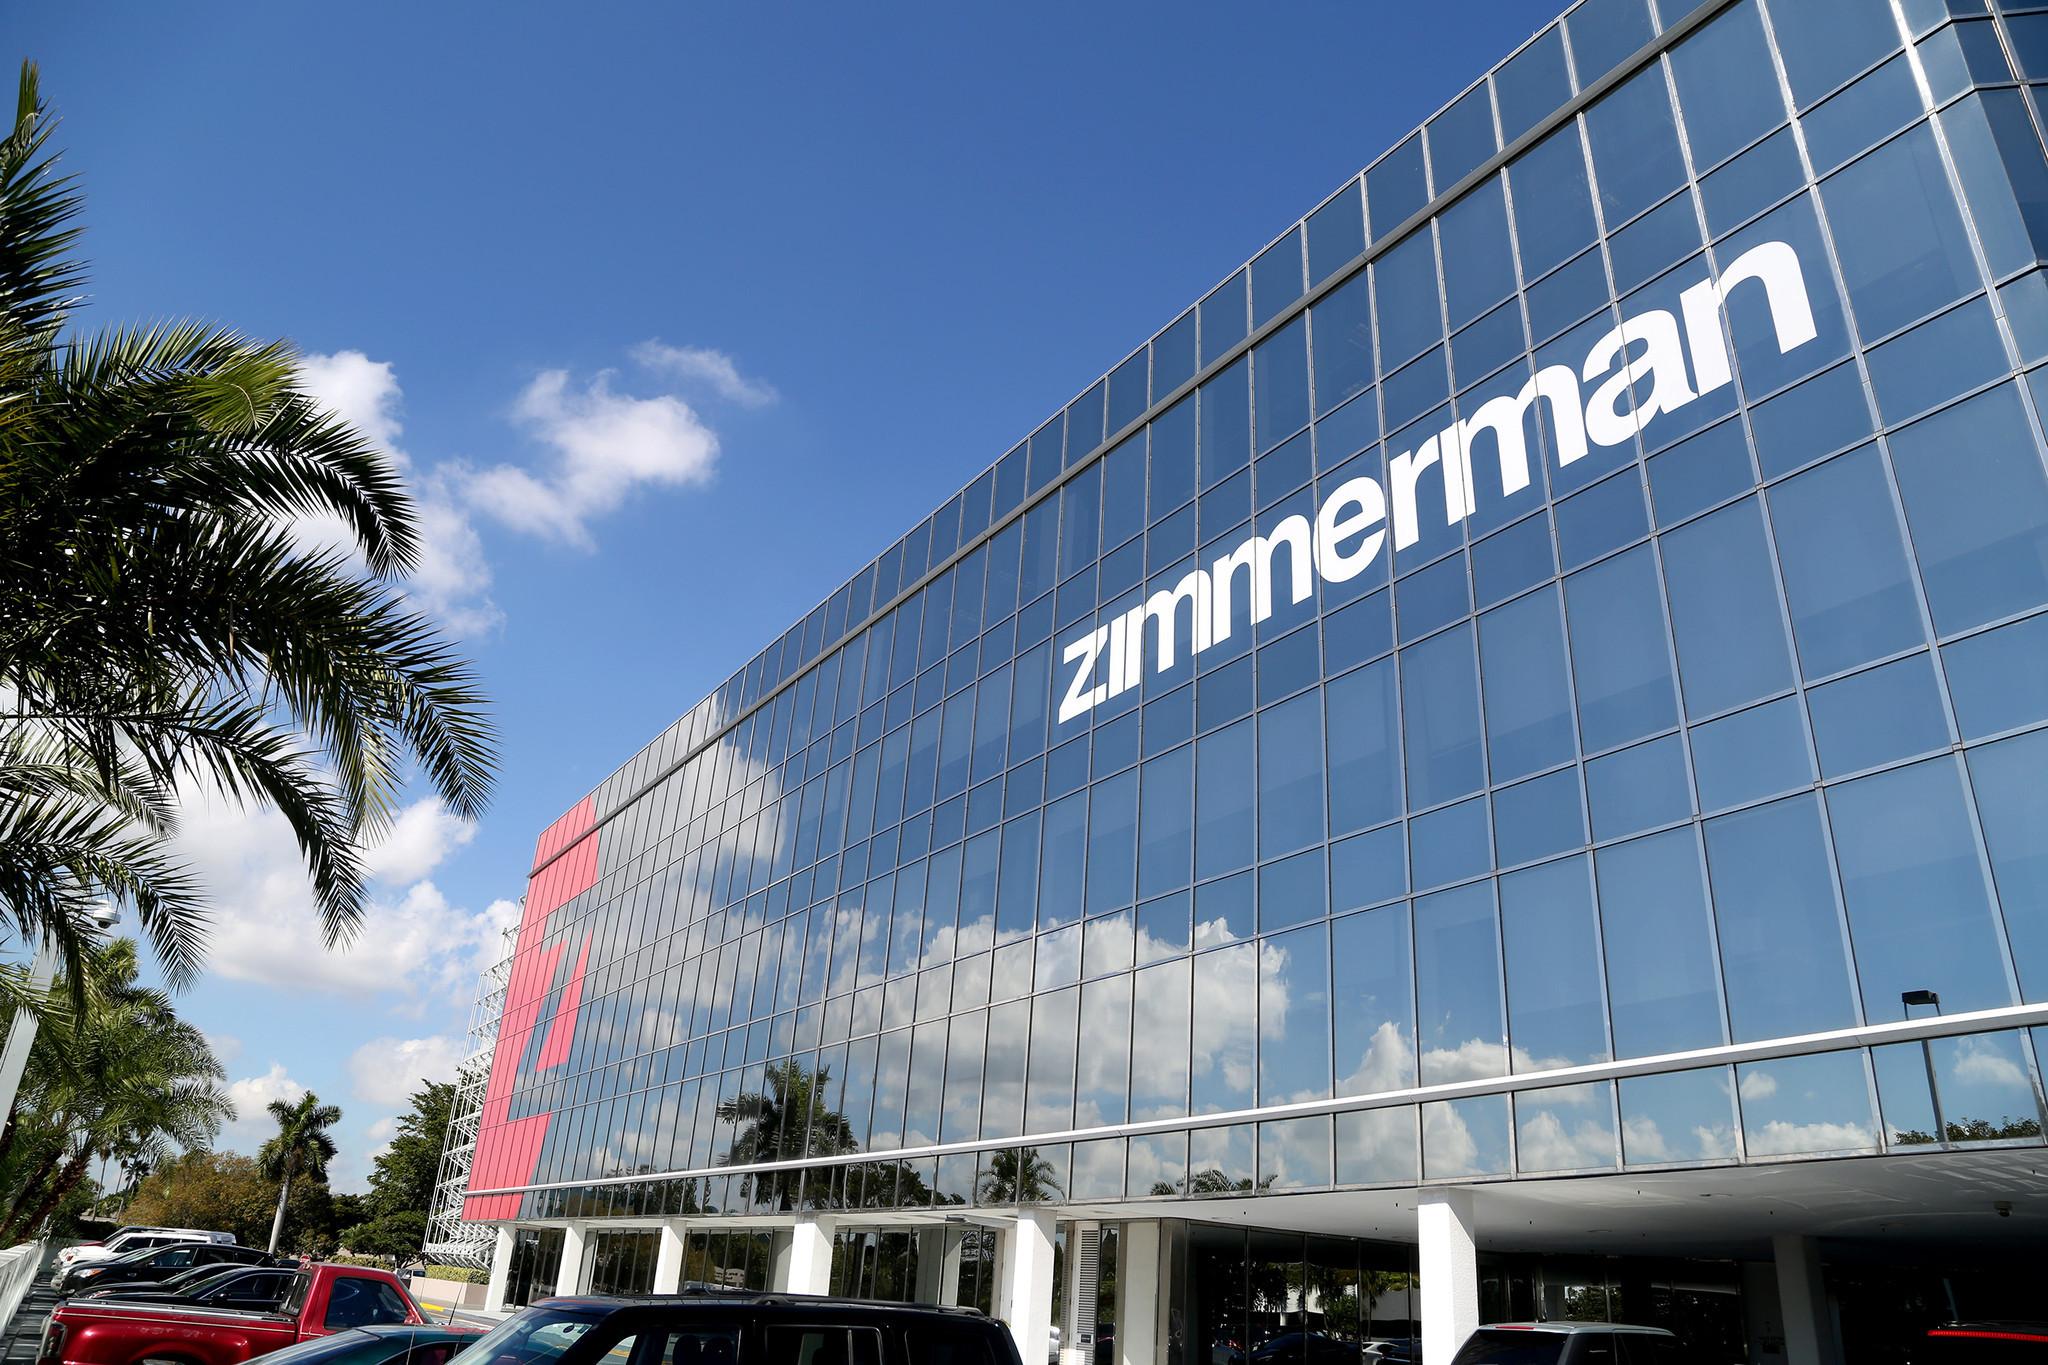 zimmerman ad agency plans job fair wednesday sun sentinel